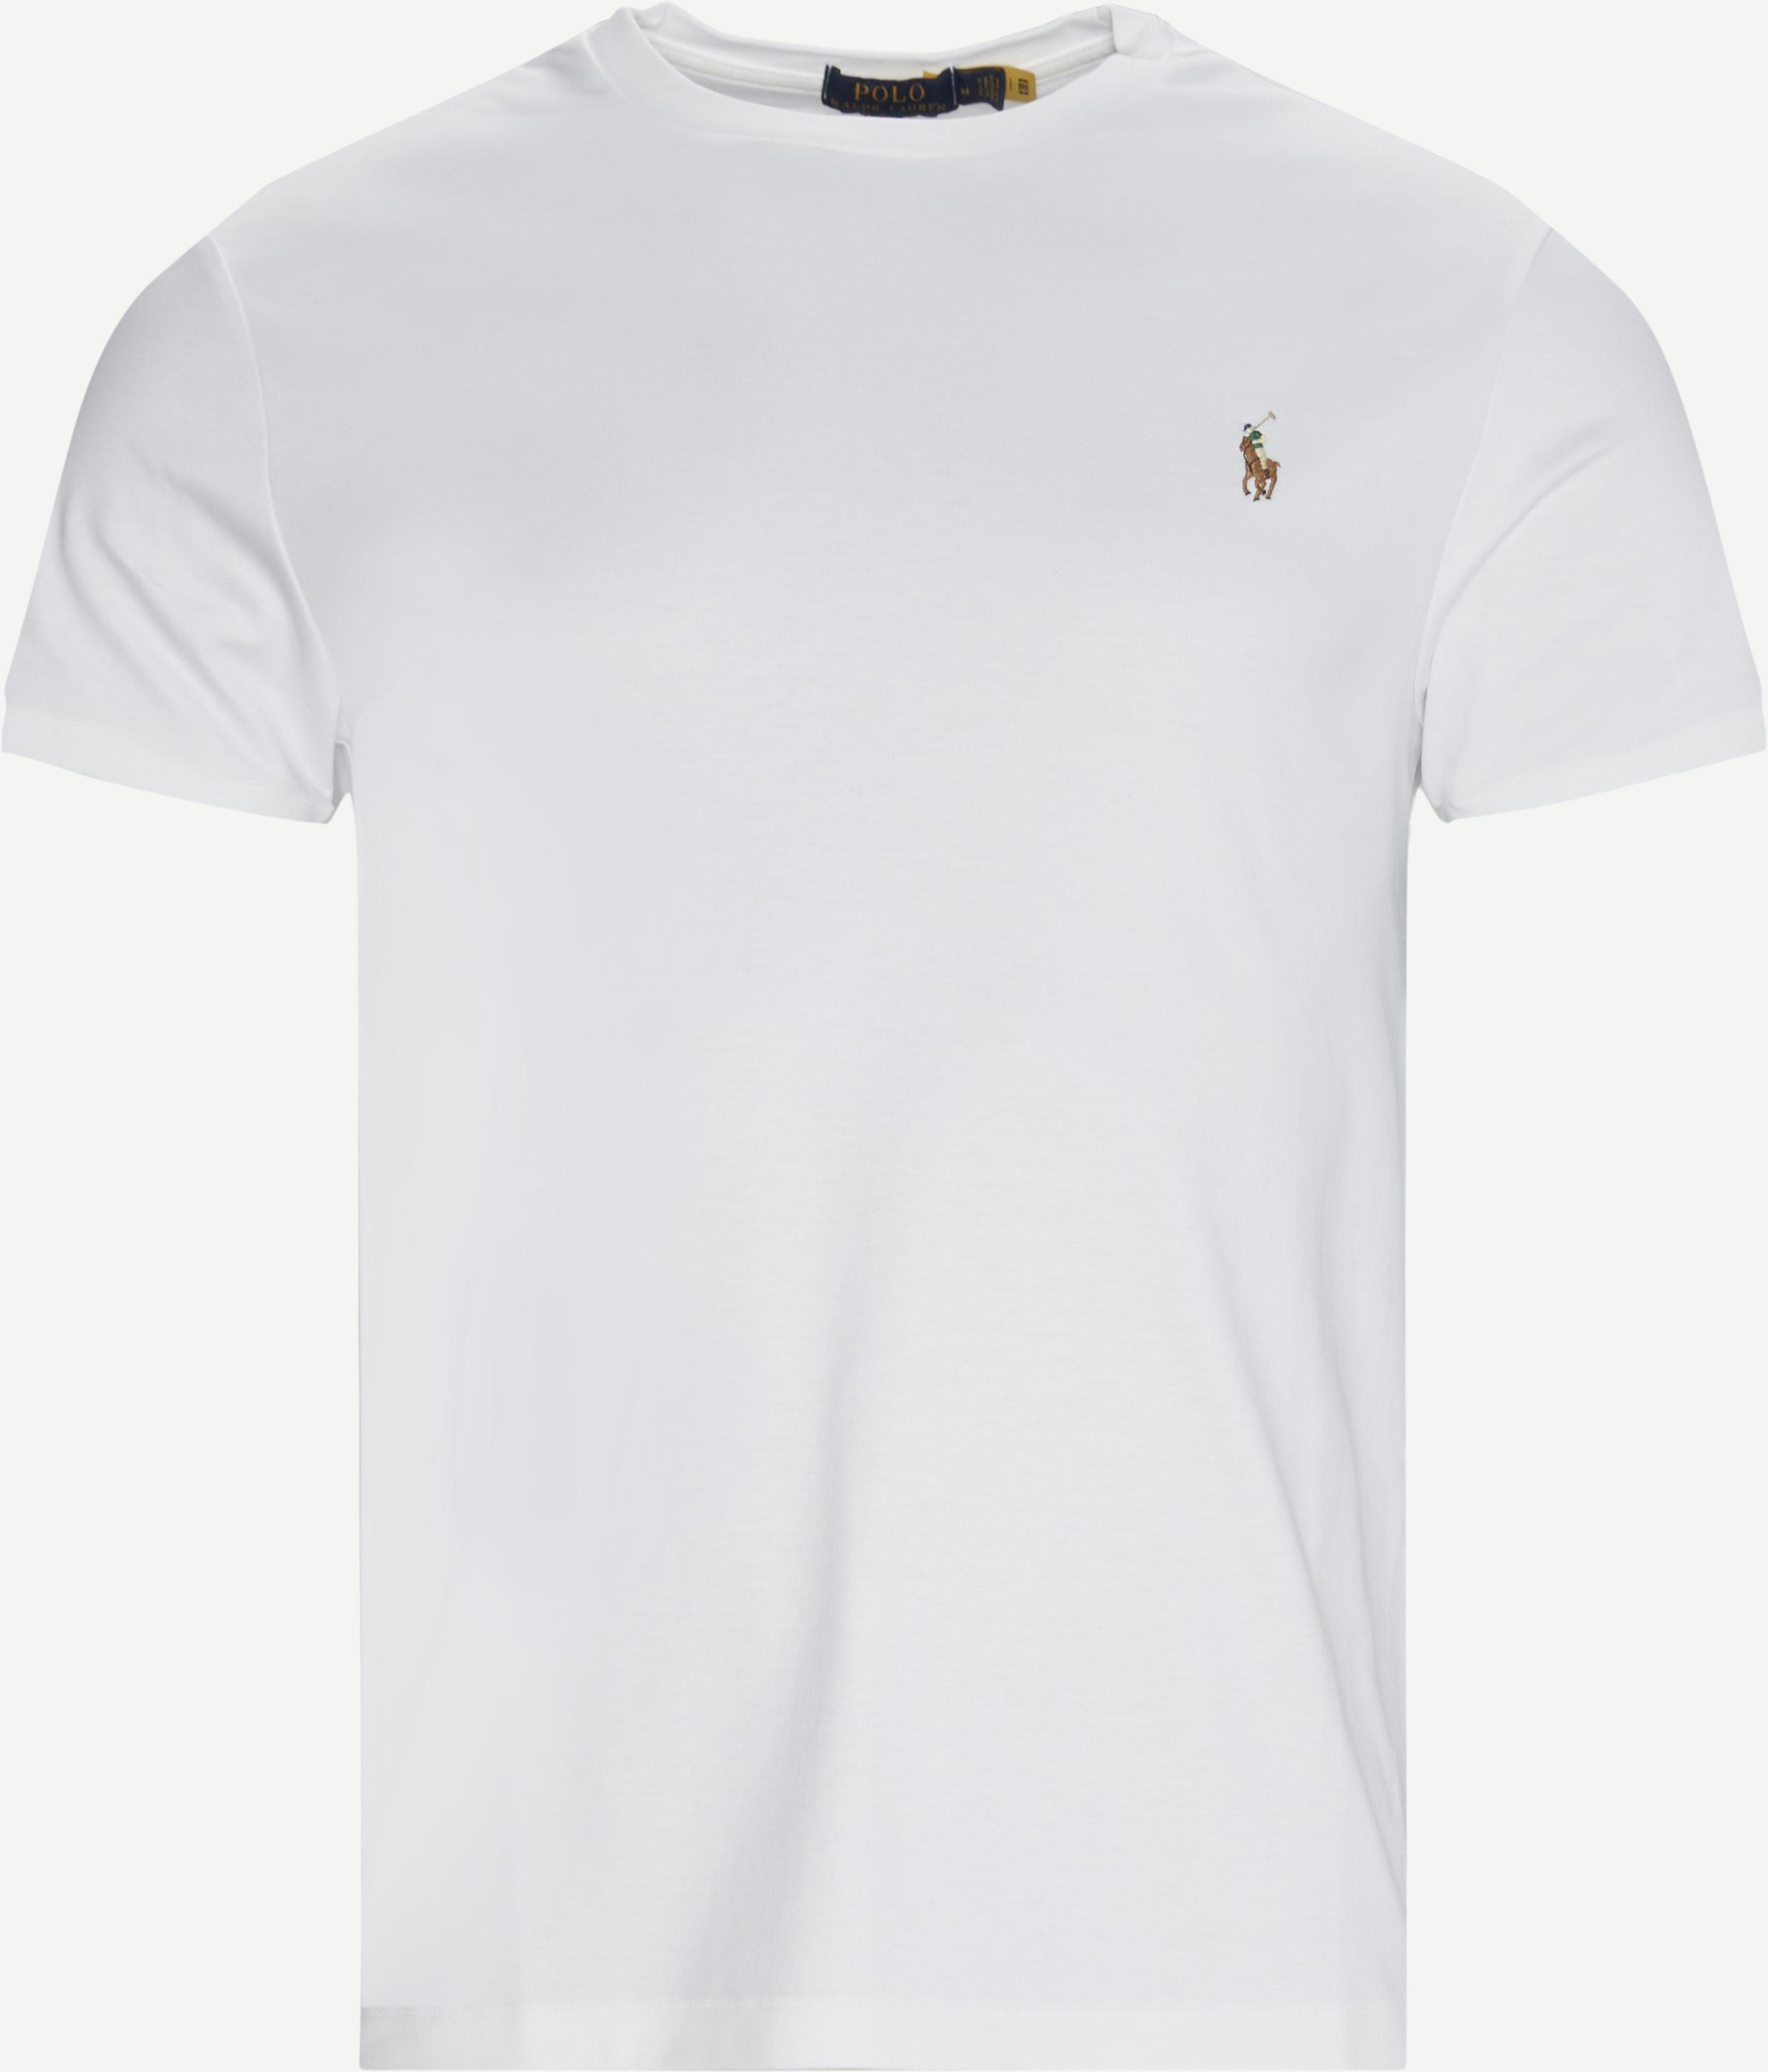 Logo T-shirt - T-shirts - Slim fit - White